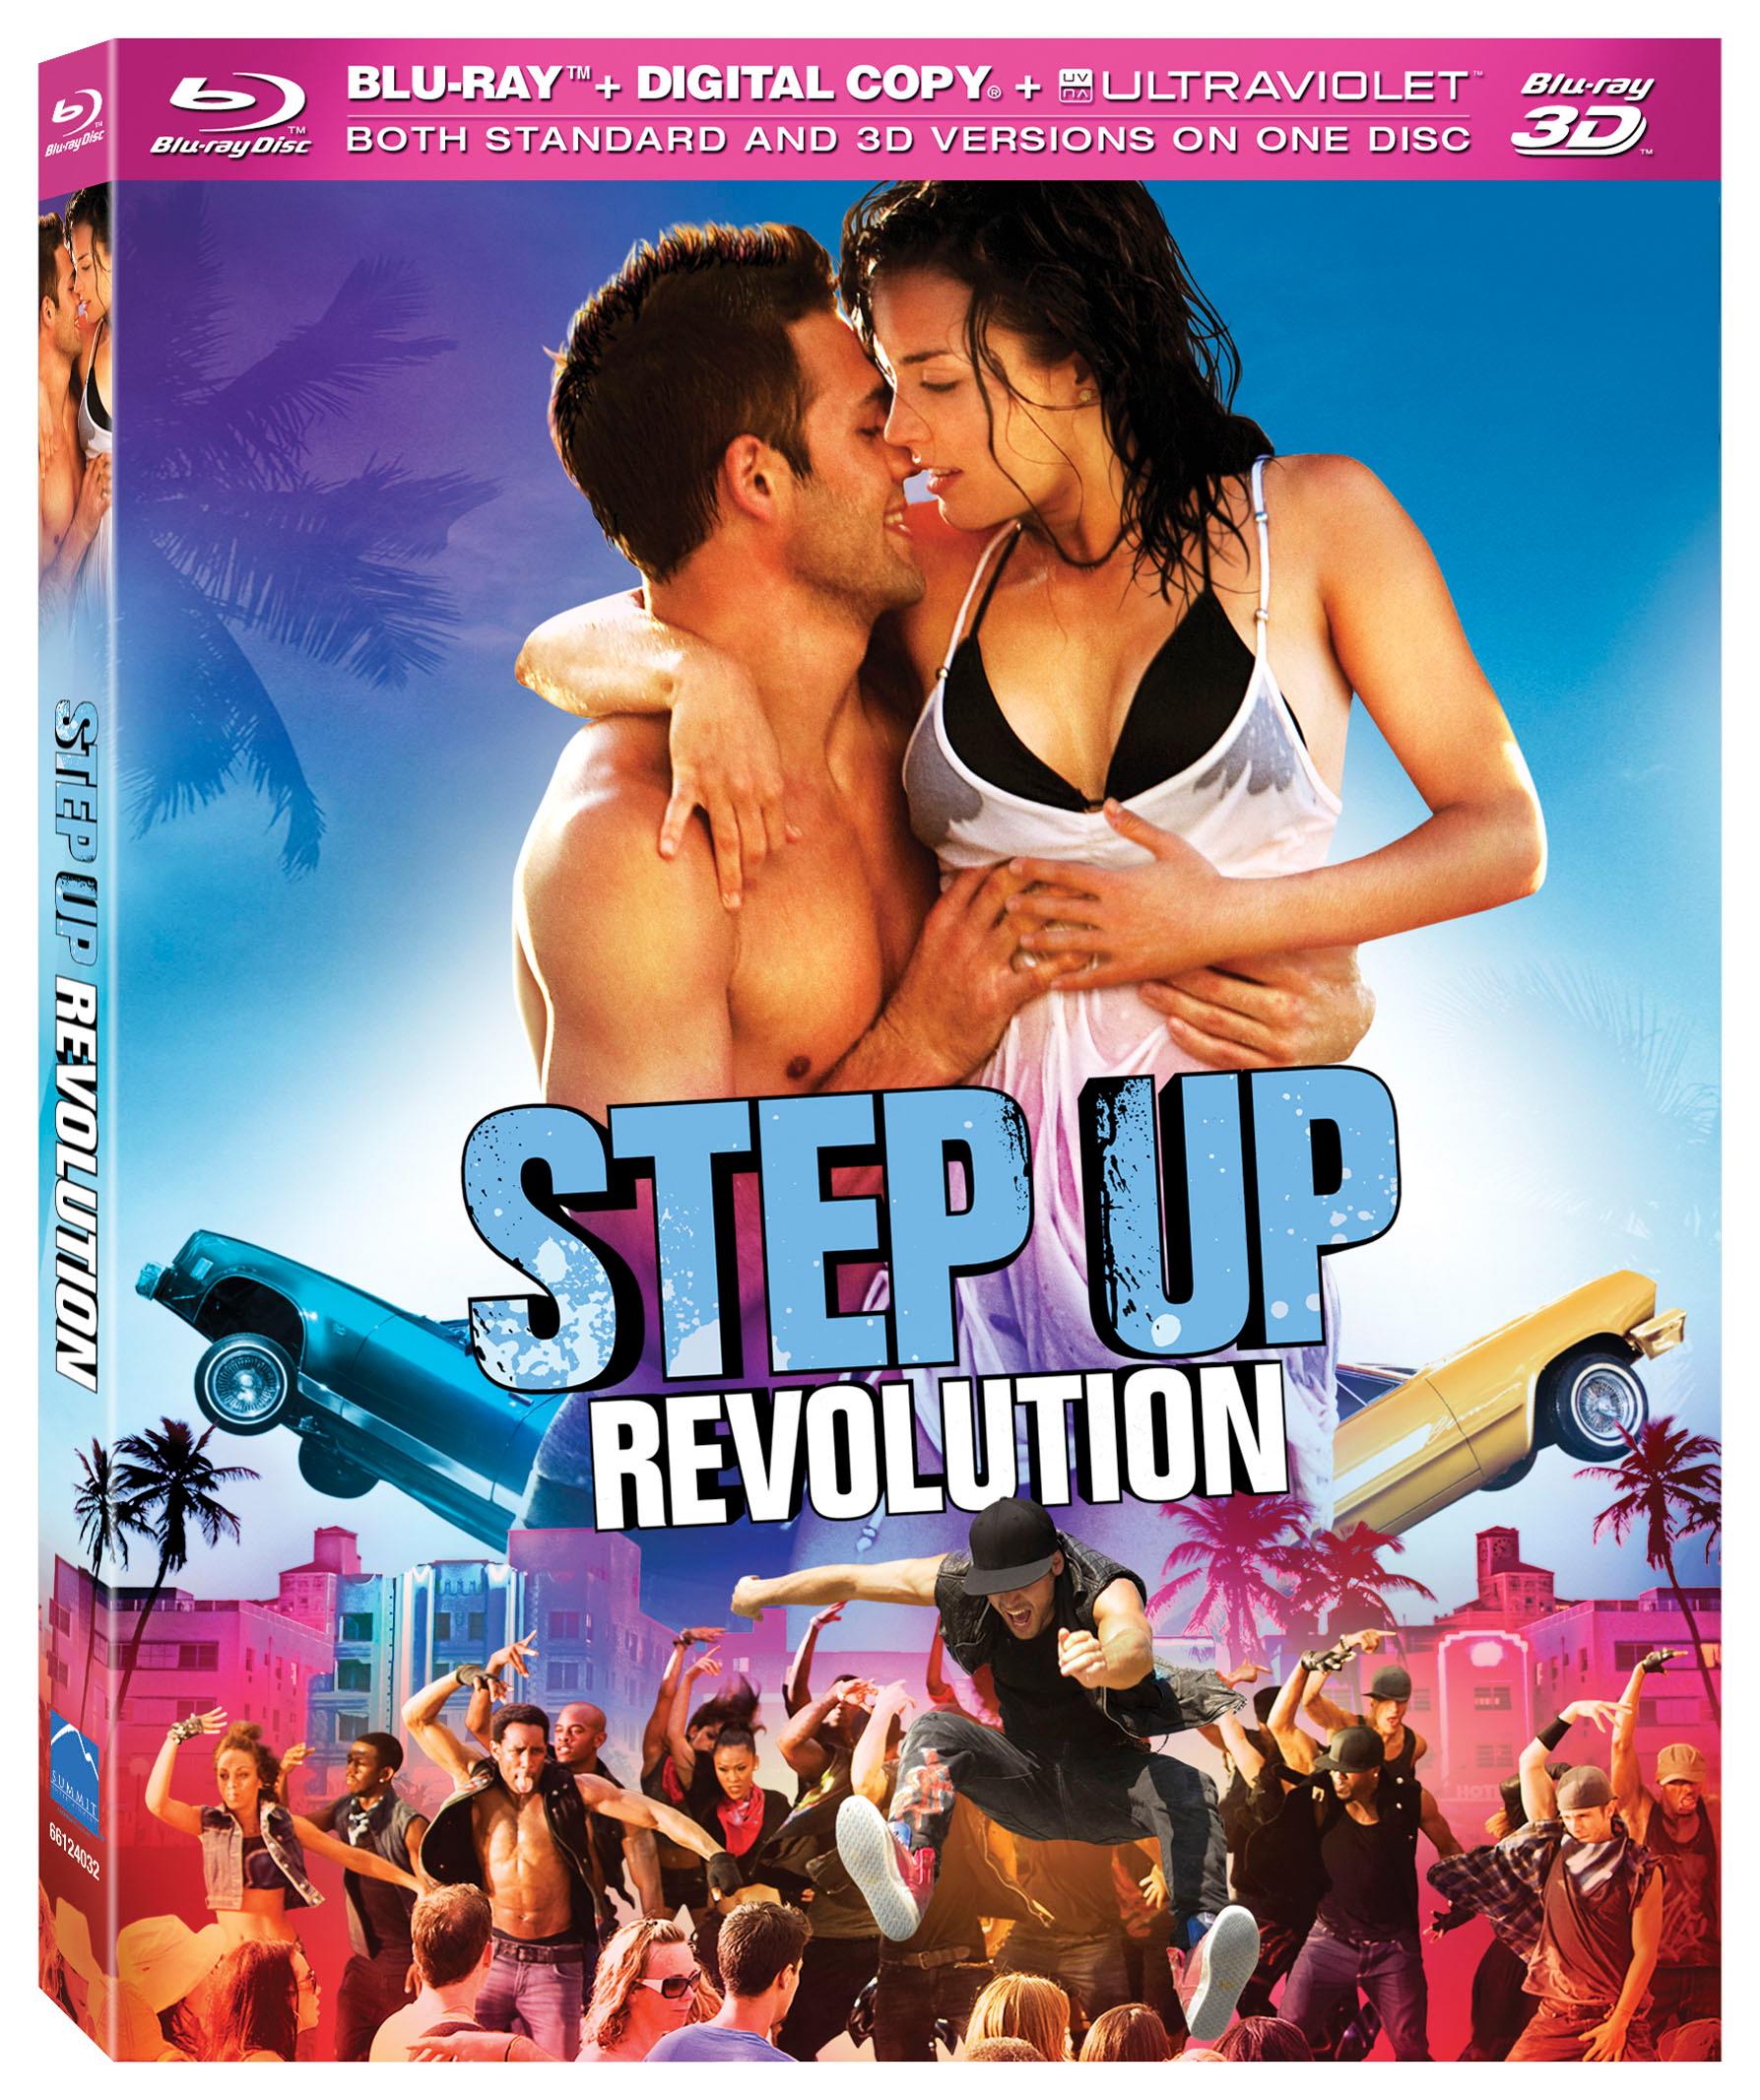 Step Up Revolution (Blu-ray Disc)